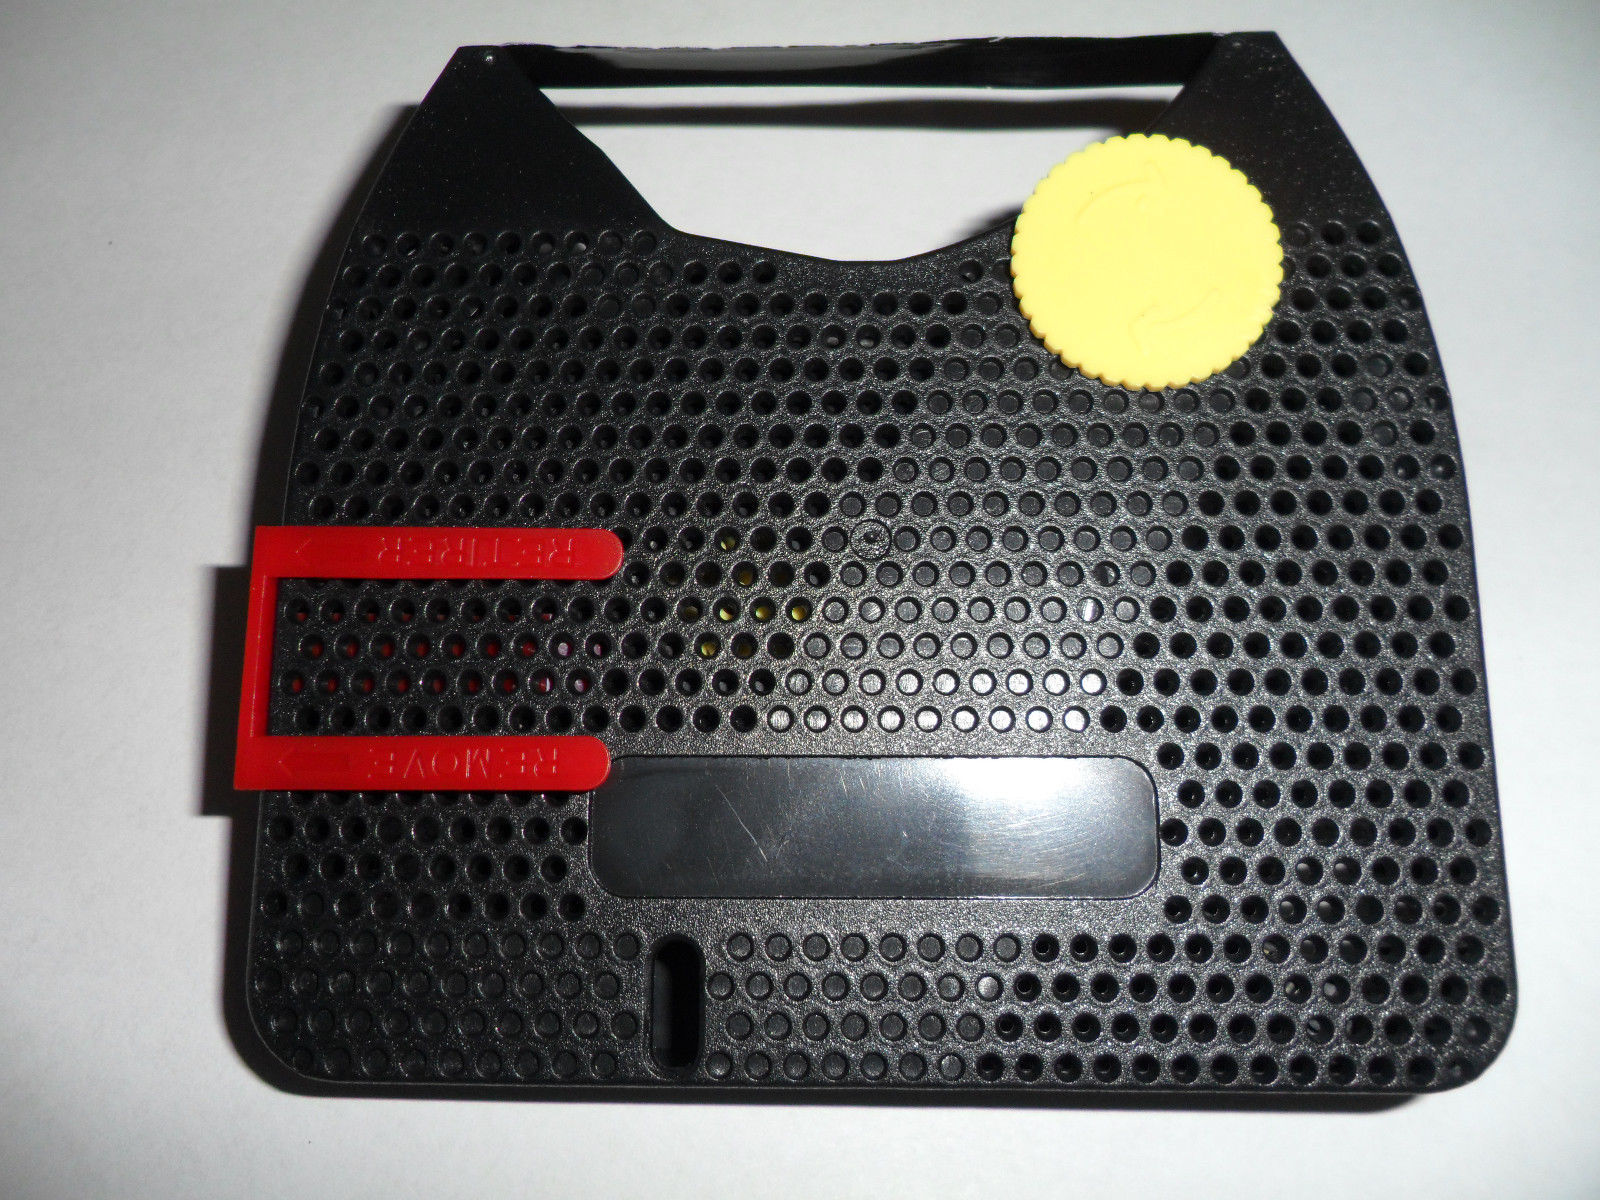 Smith Corona Mark XVI Mark XVII Typewriter Ribbon (2 Pack) Replaces 21000